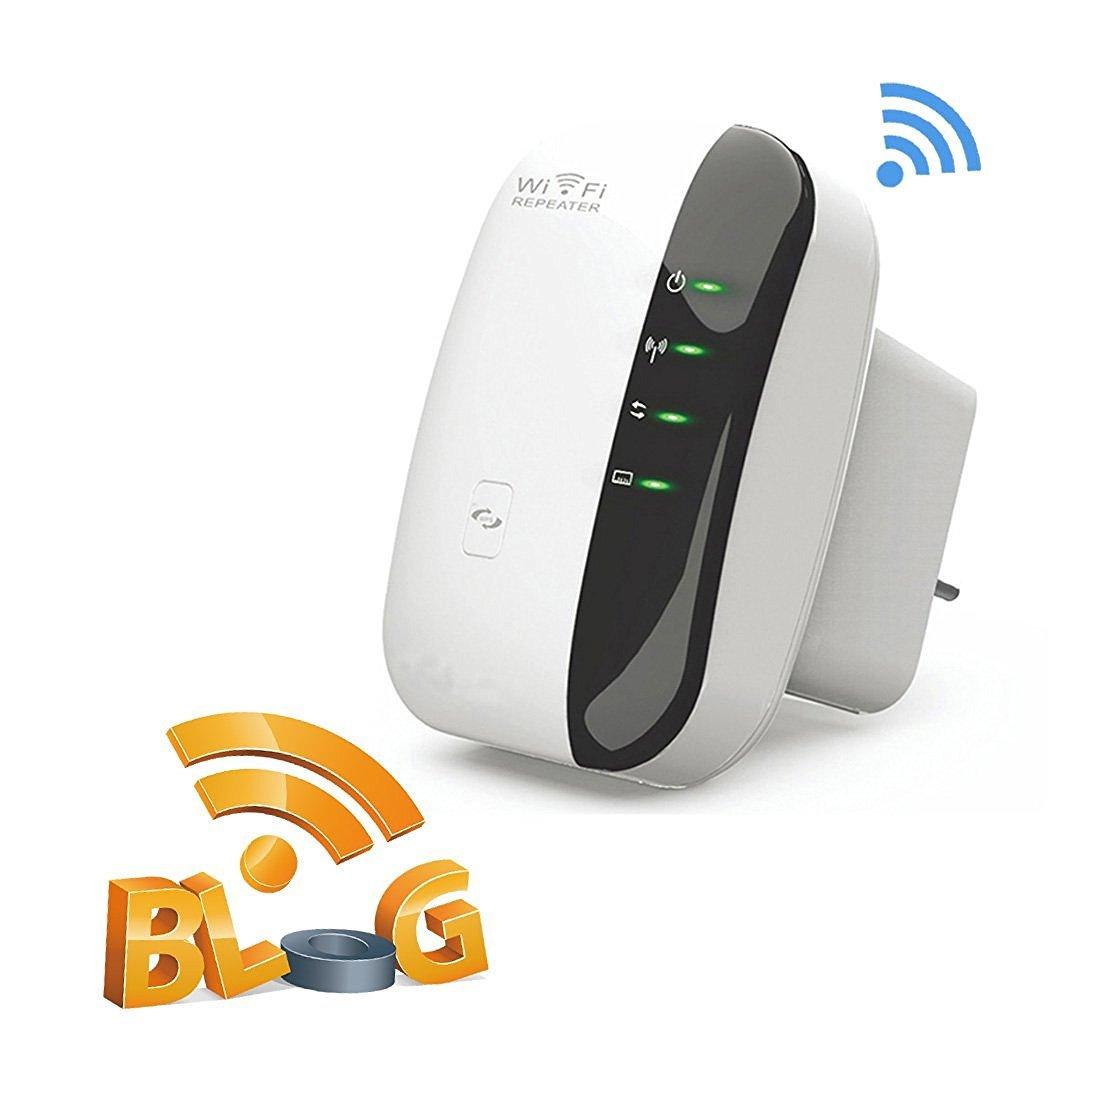 WLAN Repeater WLAN Verstärker Wireless Repeater: Amazon.de: Elektronik